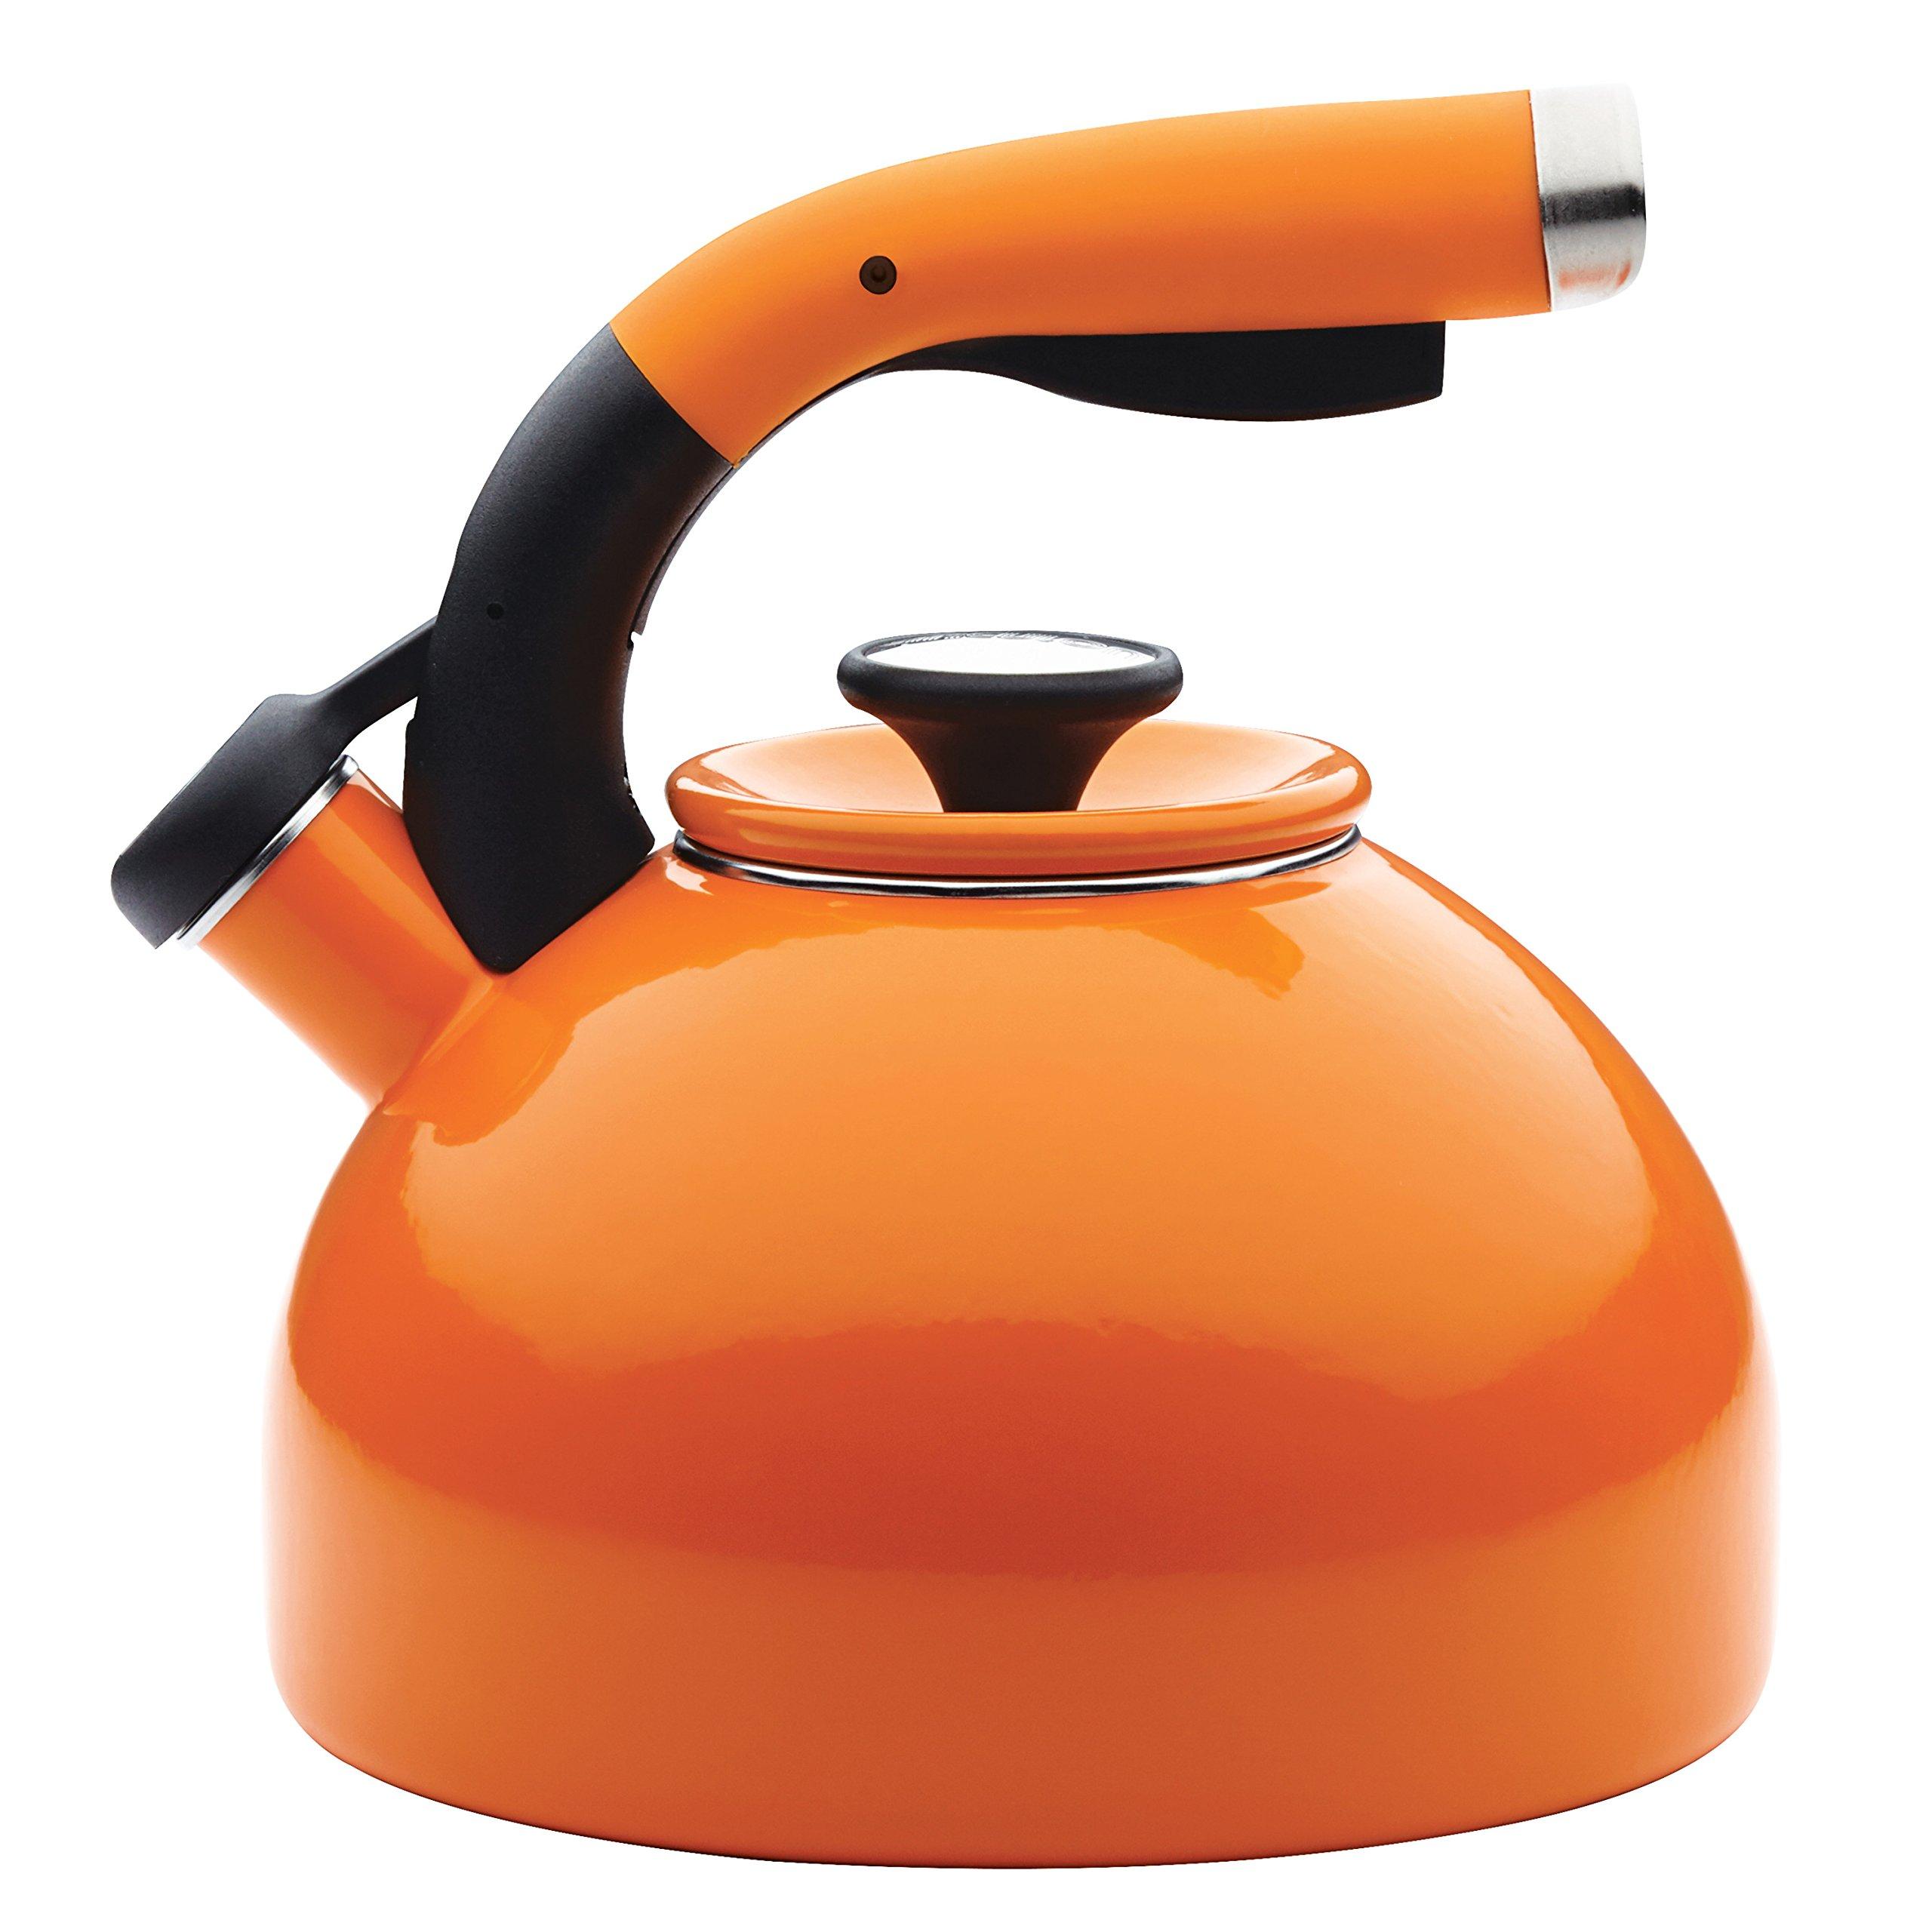 Circulon 46840 Teakettles, 2 quart, Orange by Circulon